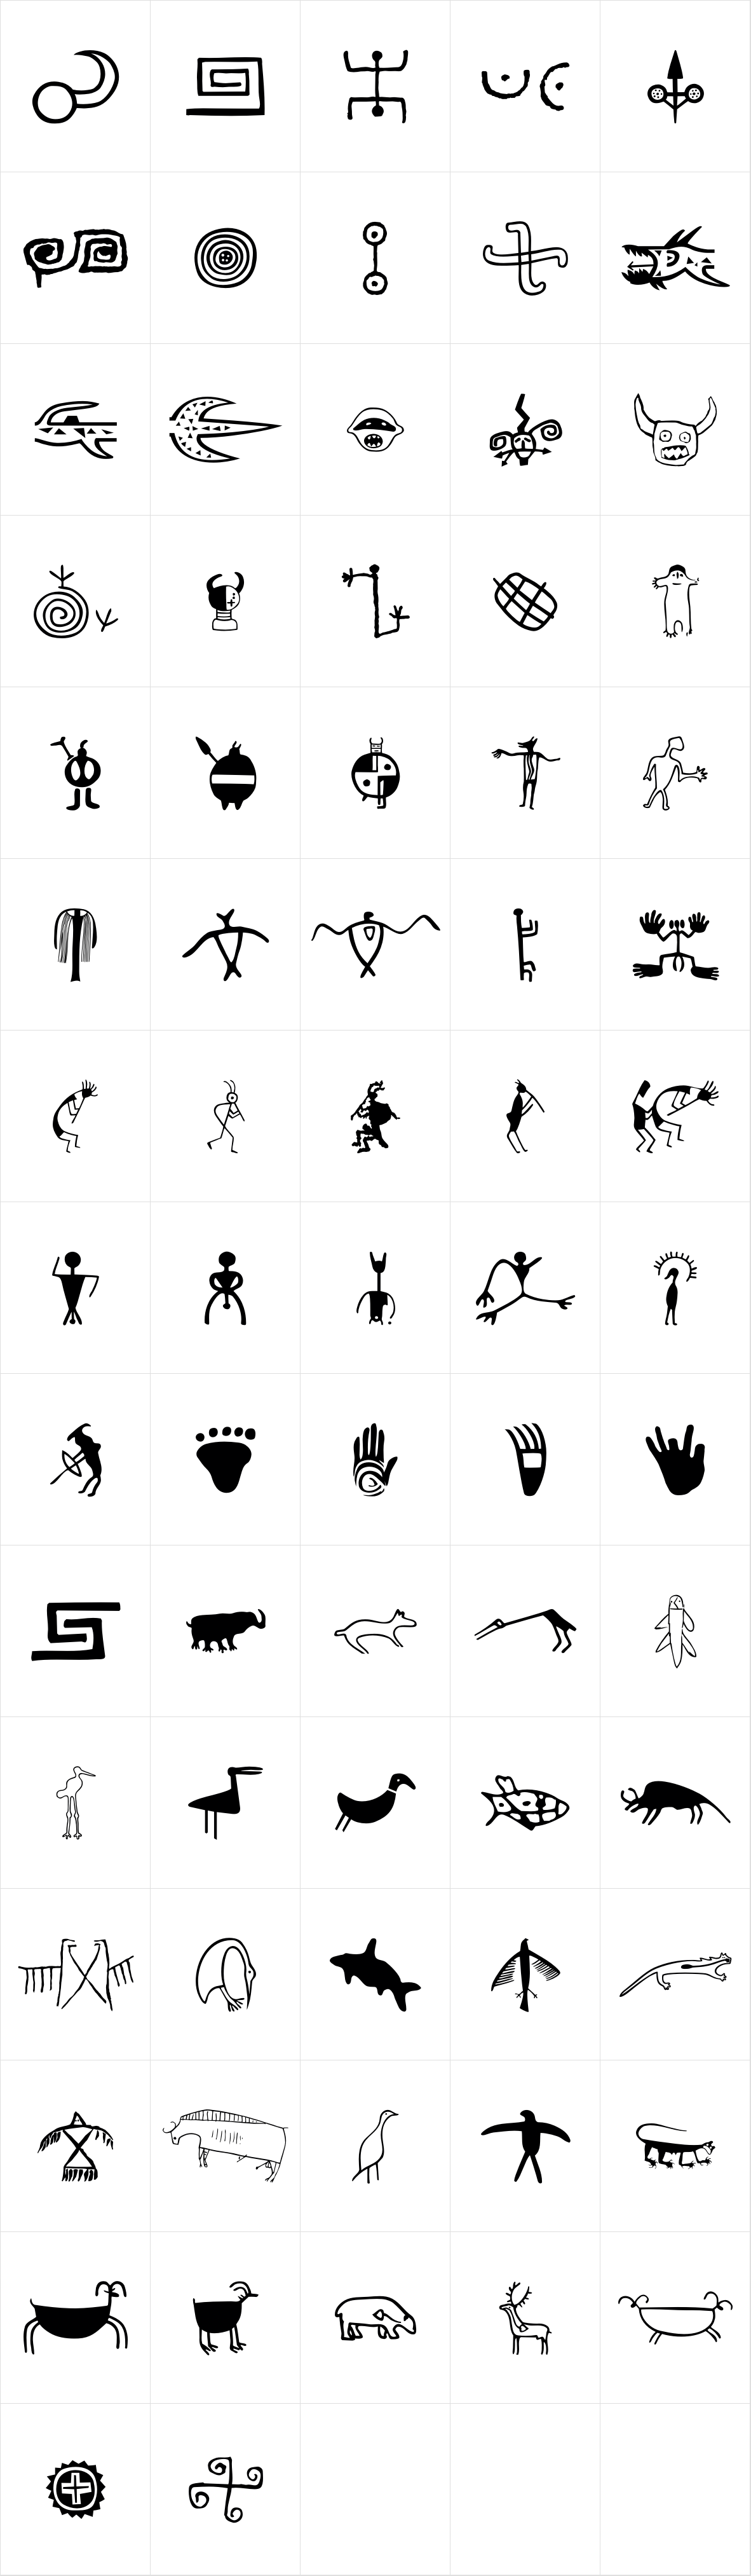 P22 Petroglyphs North American